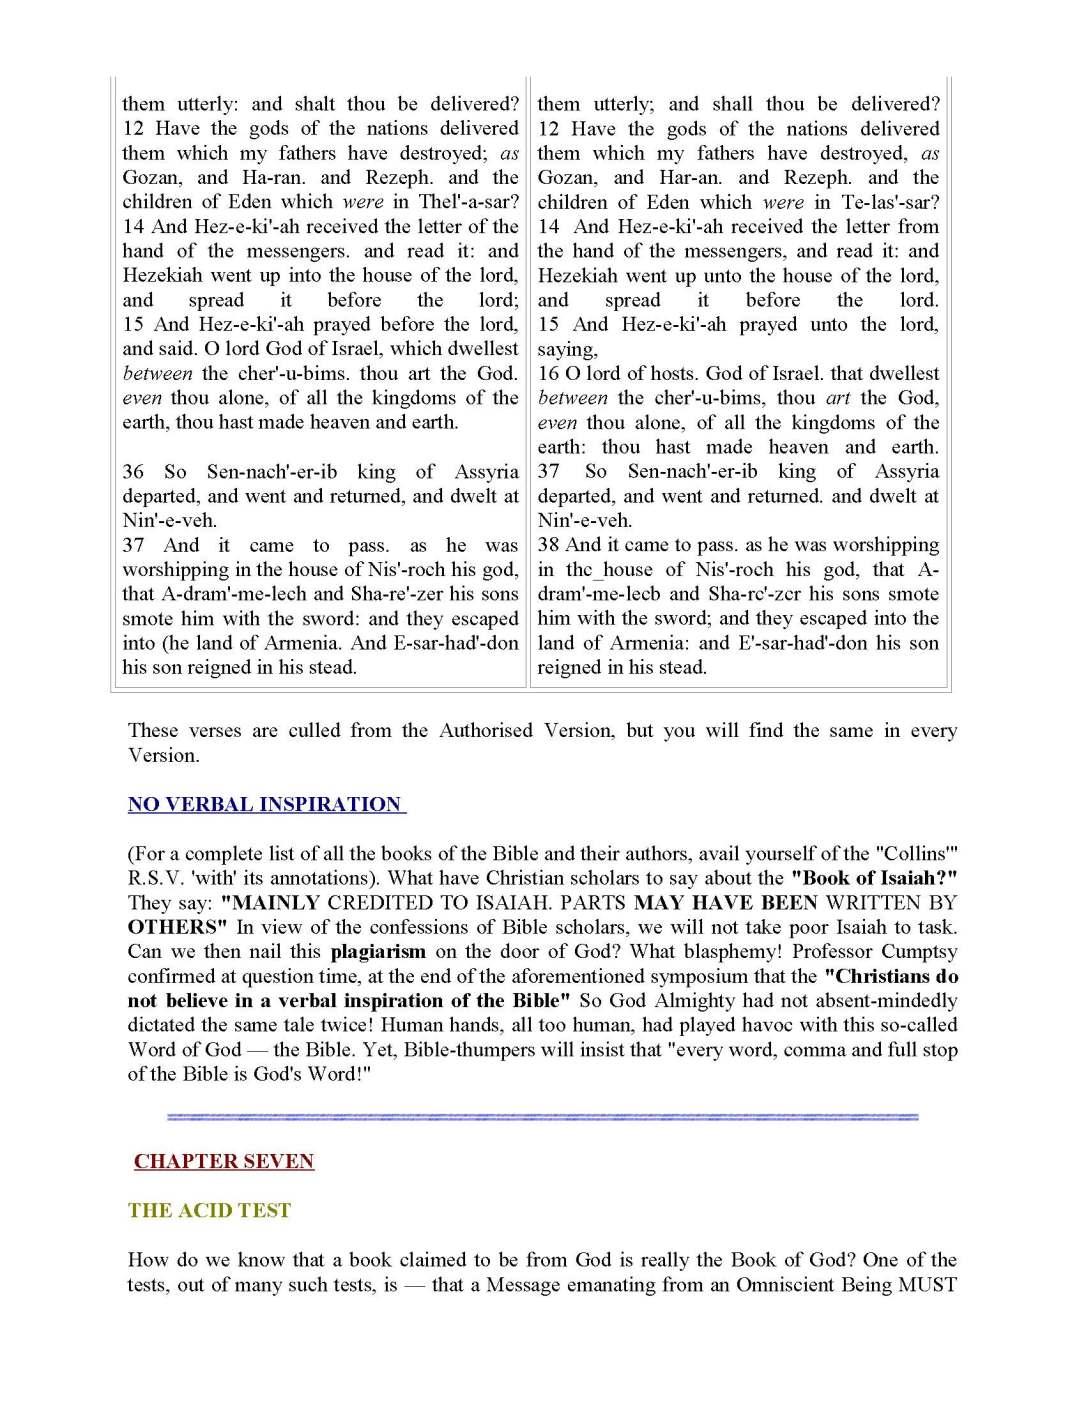 Is The Bible Gods Word [deedat]_Page_25